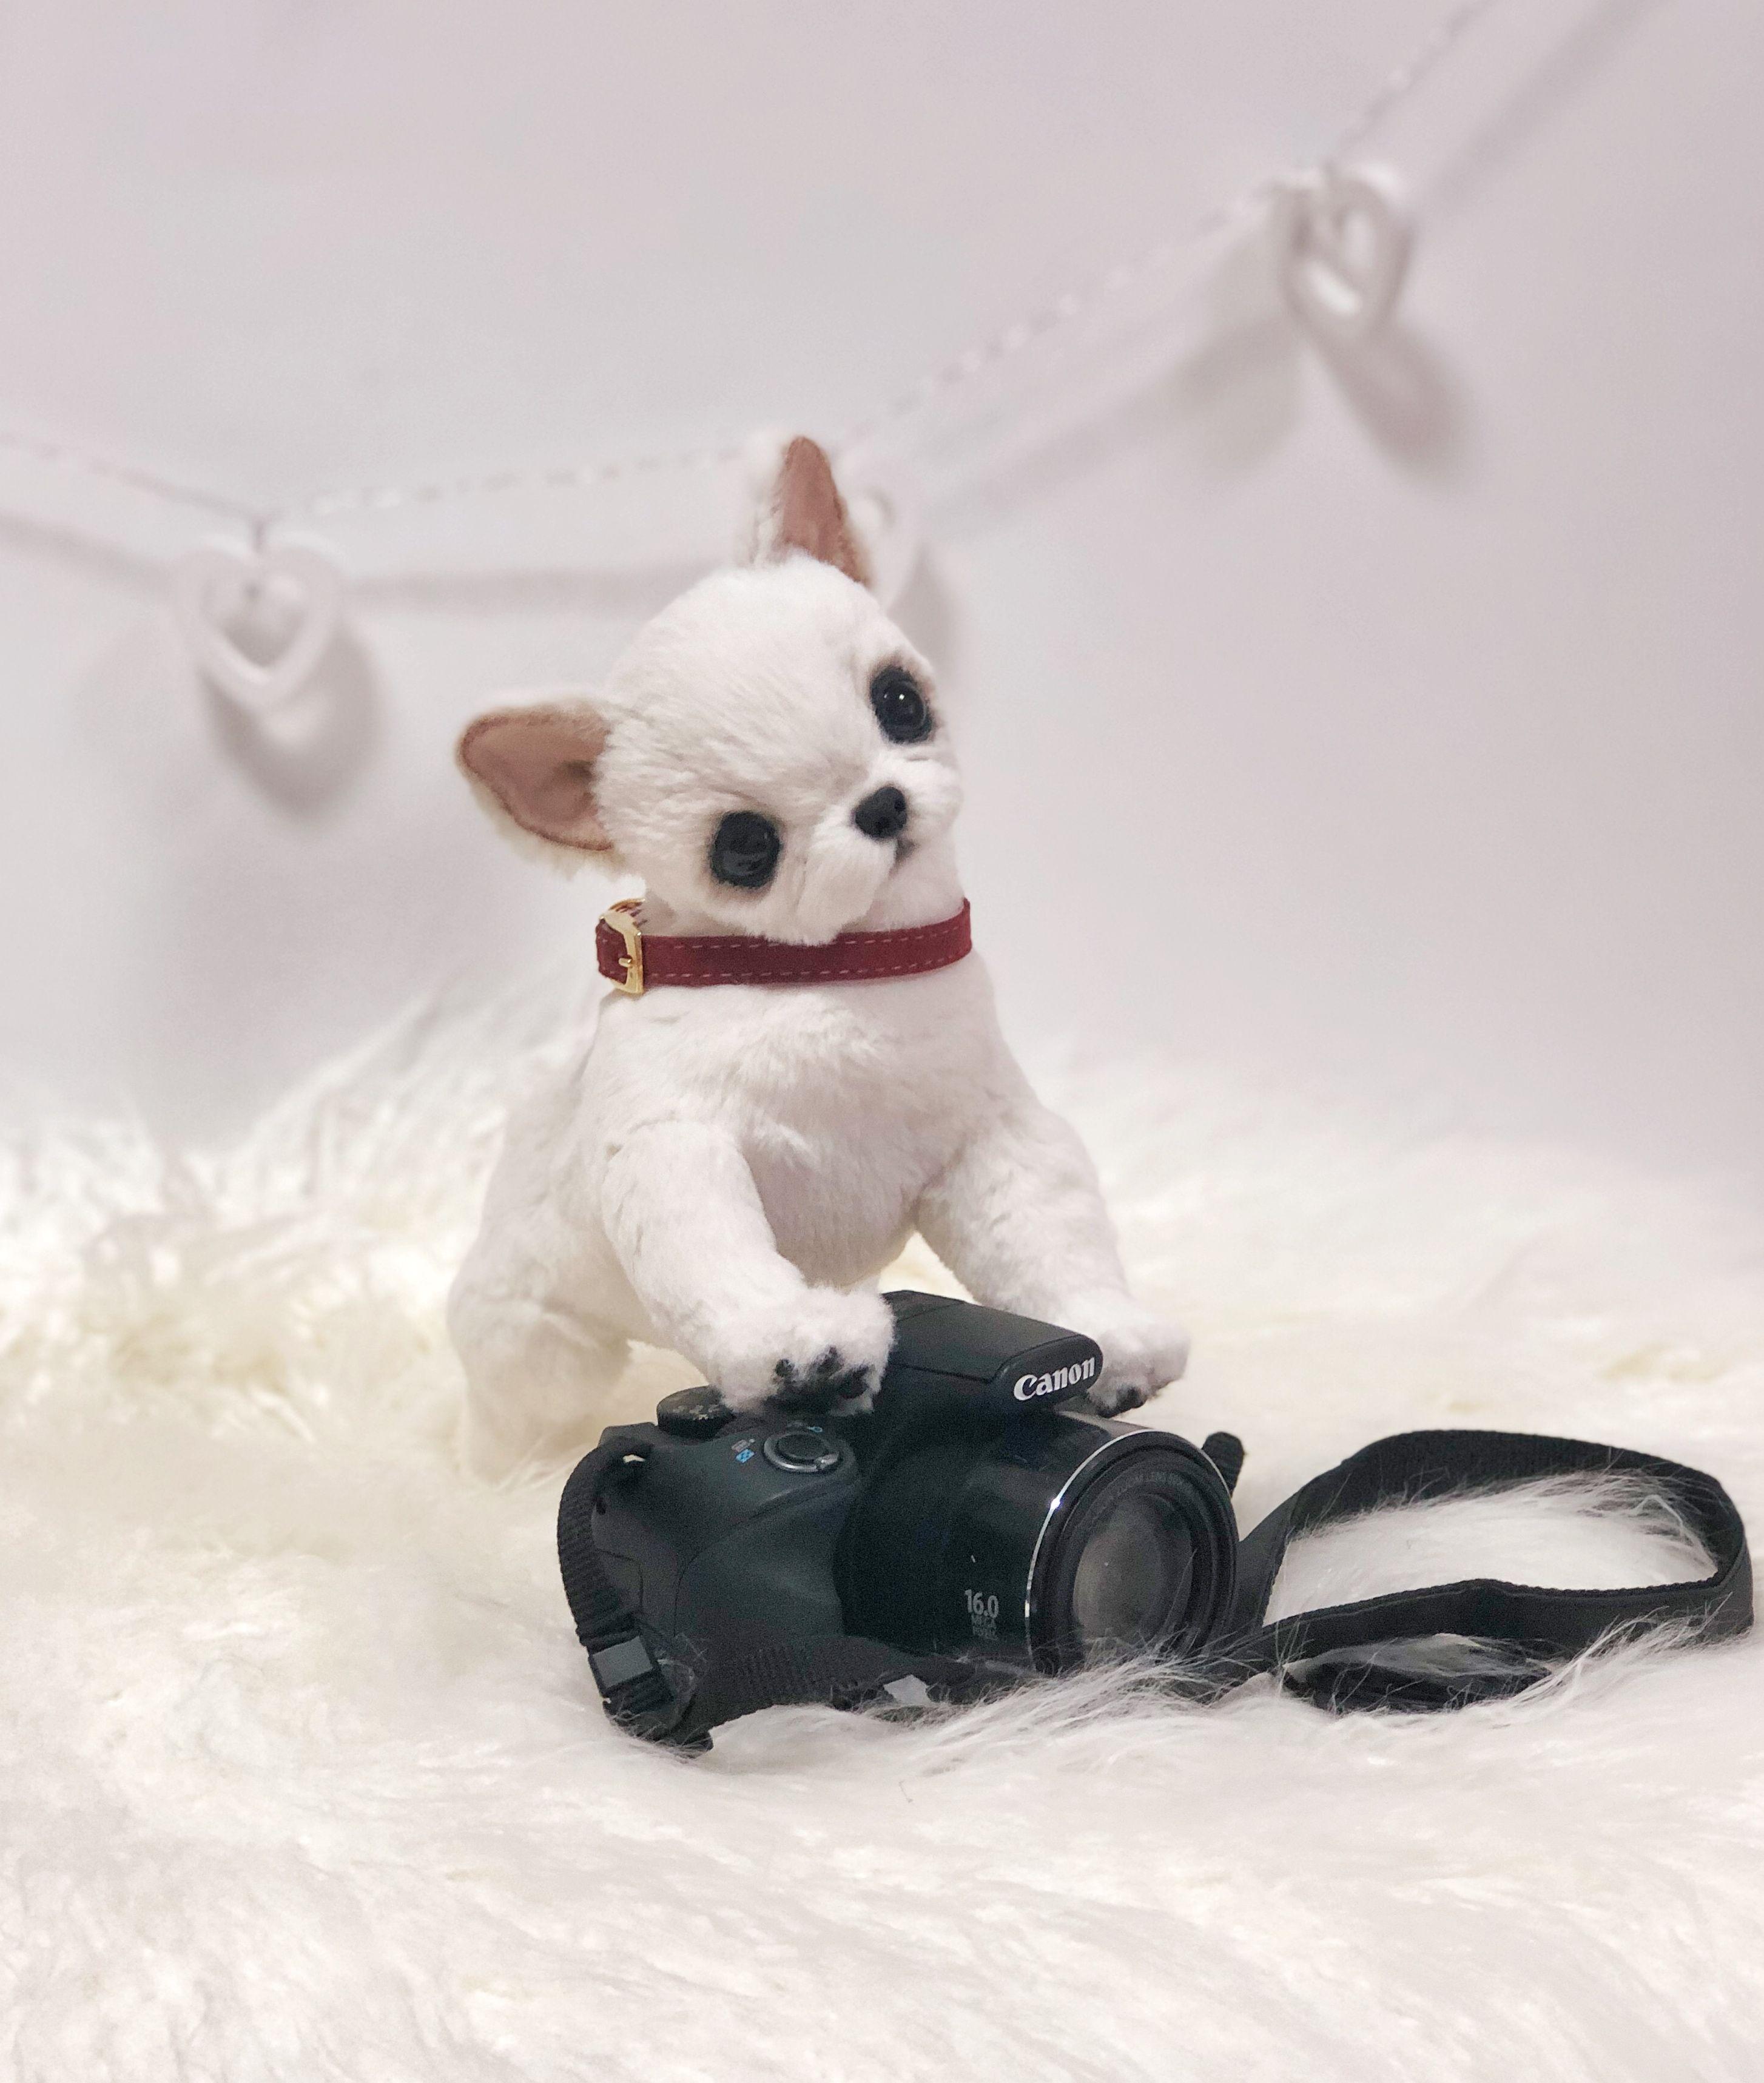 Chihuahua Chihuahua Puppy Ooak Chihuahua Dog Realistic Etsy Chihuahua Puppies Realistic Stuffed Animals Chihuahua Dogs [ 3434 x 2908 Pixel ]